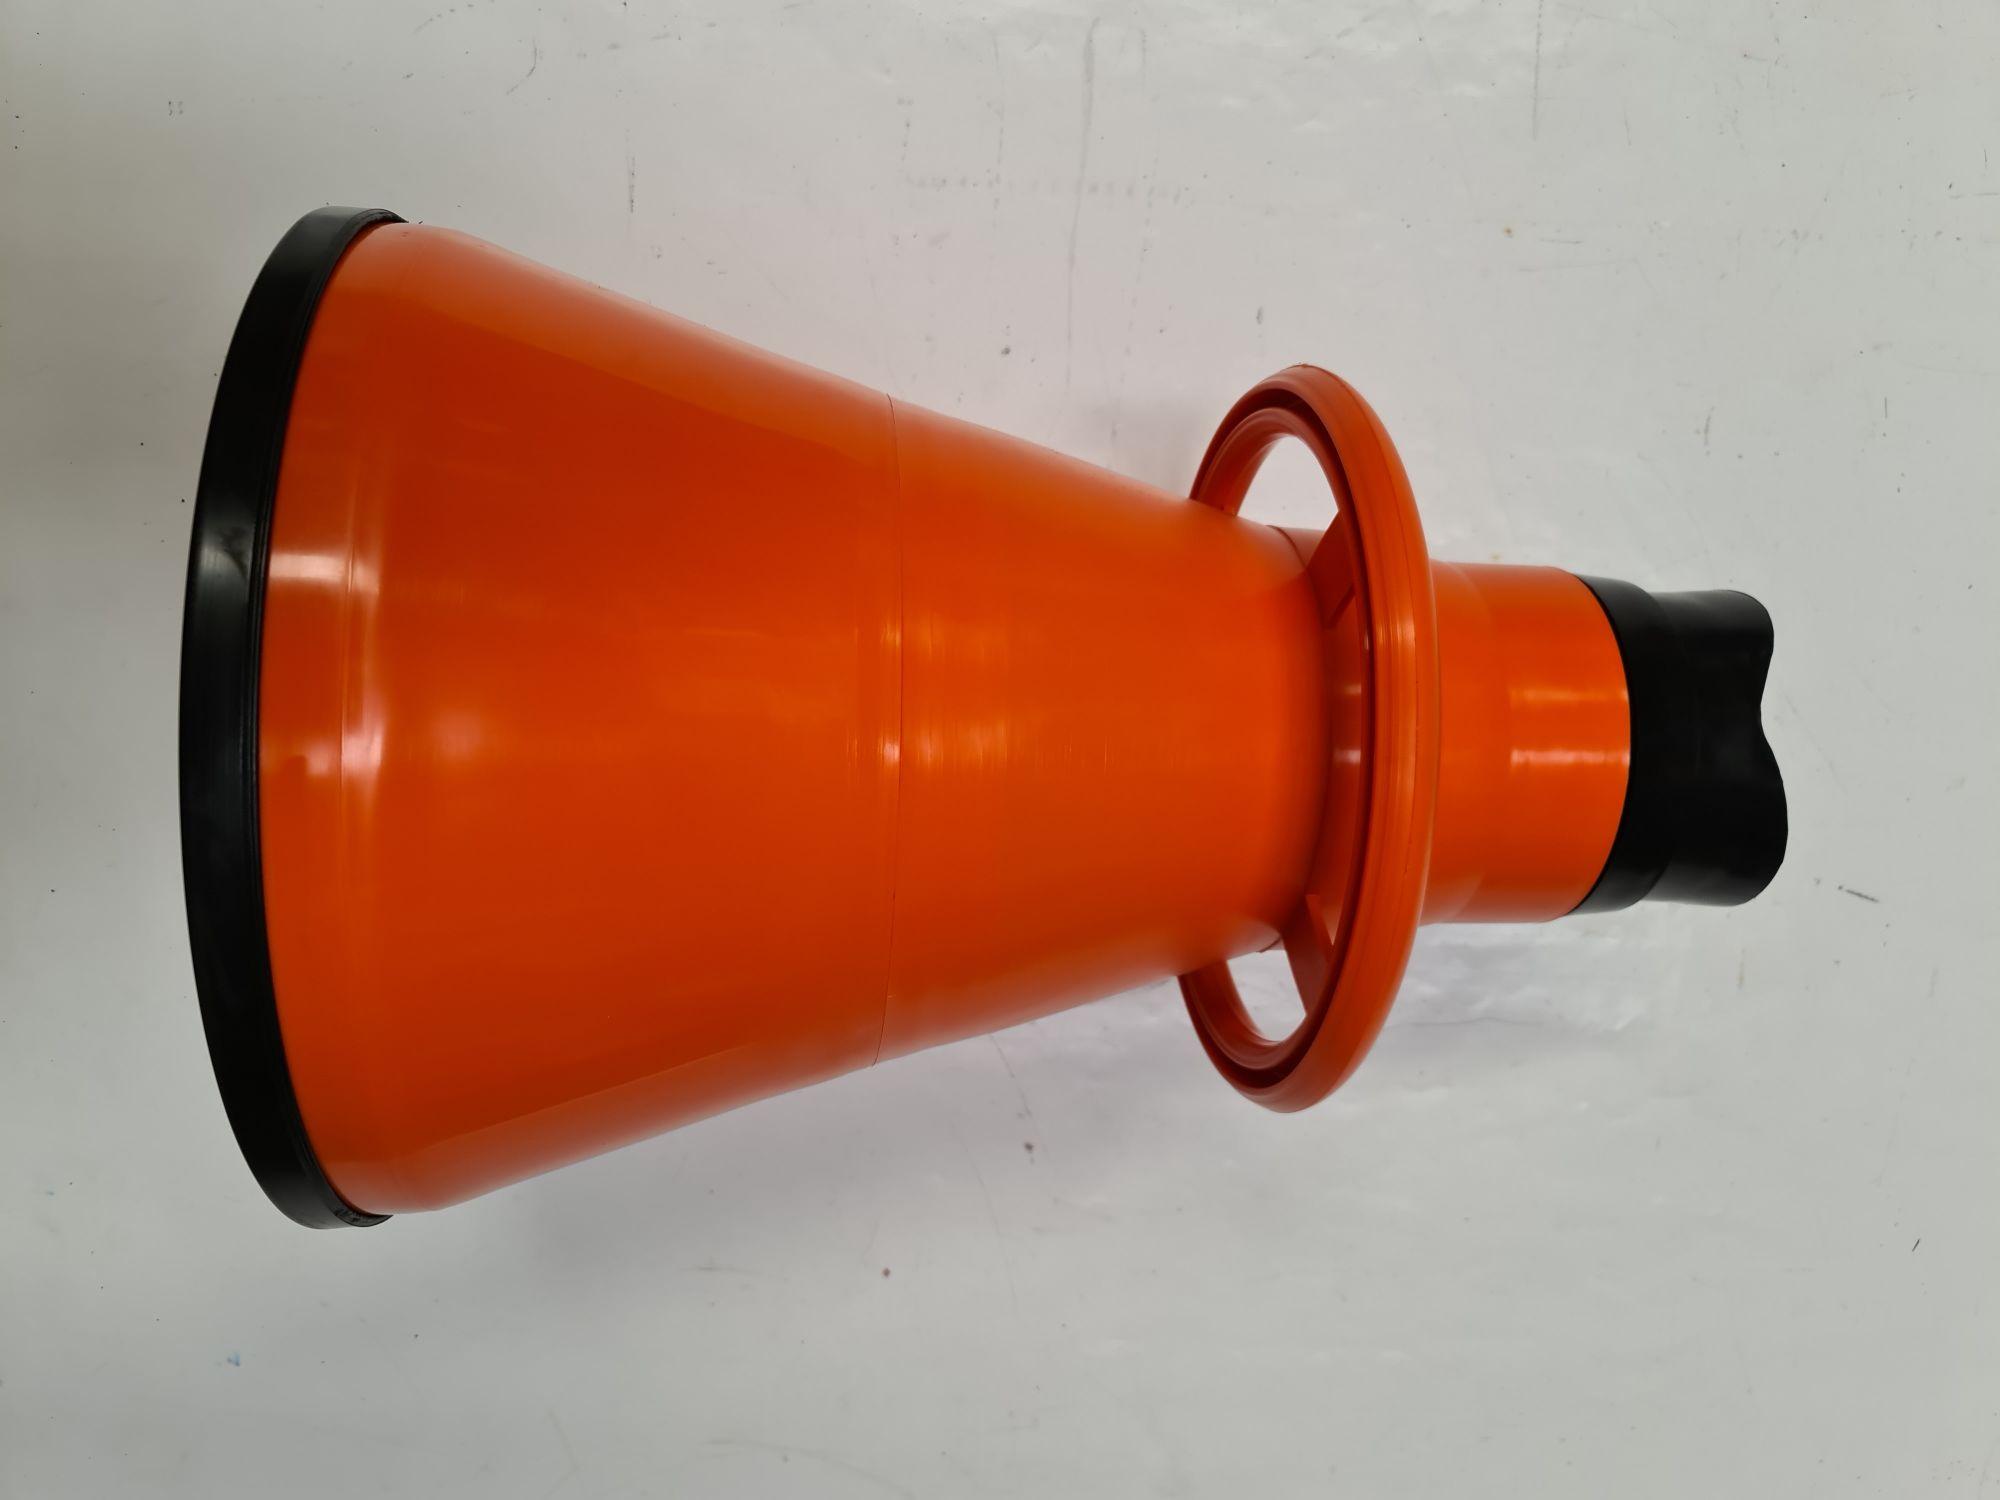 Bathyscopes For Sale in Perth, Western Australia